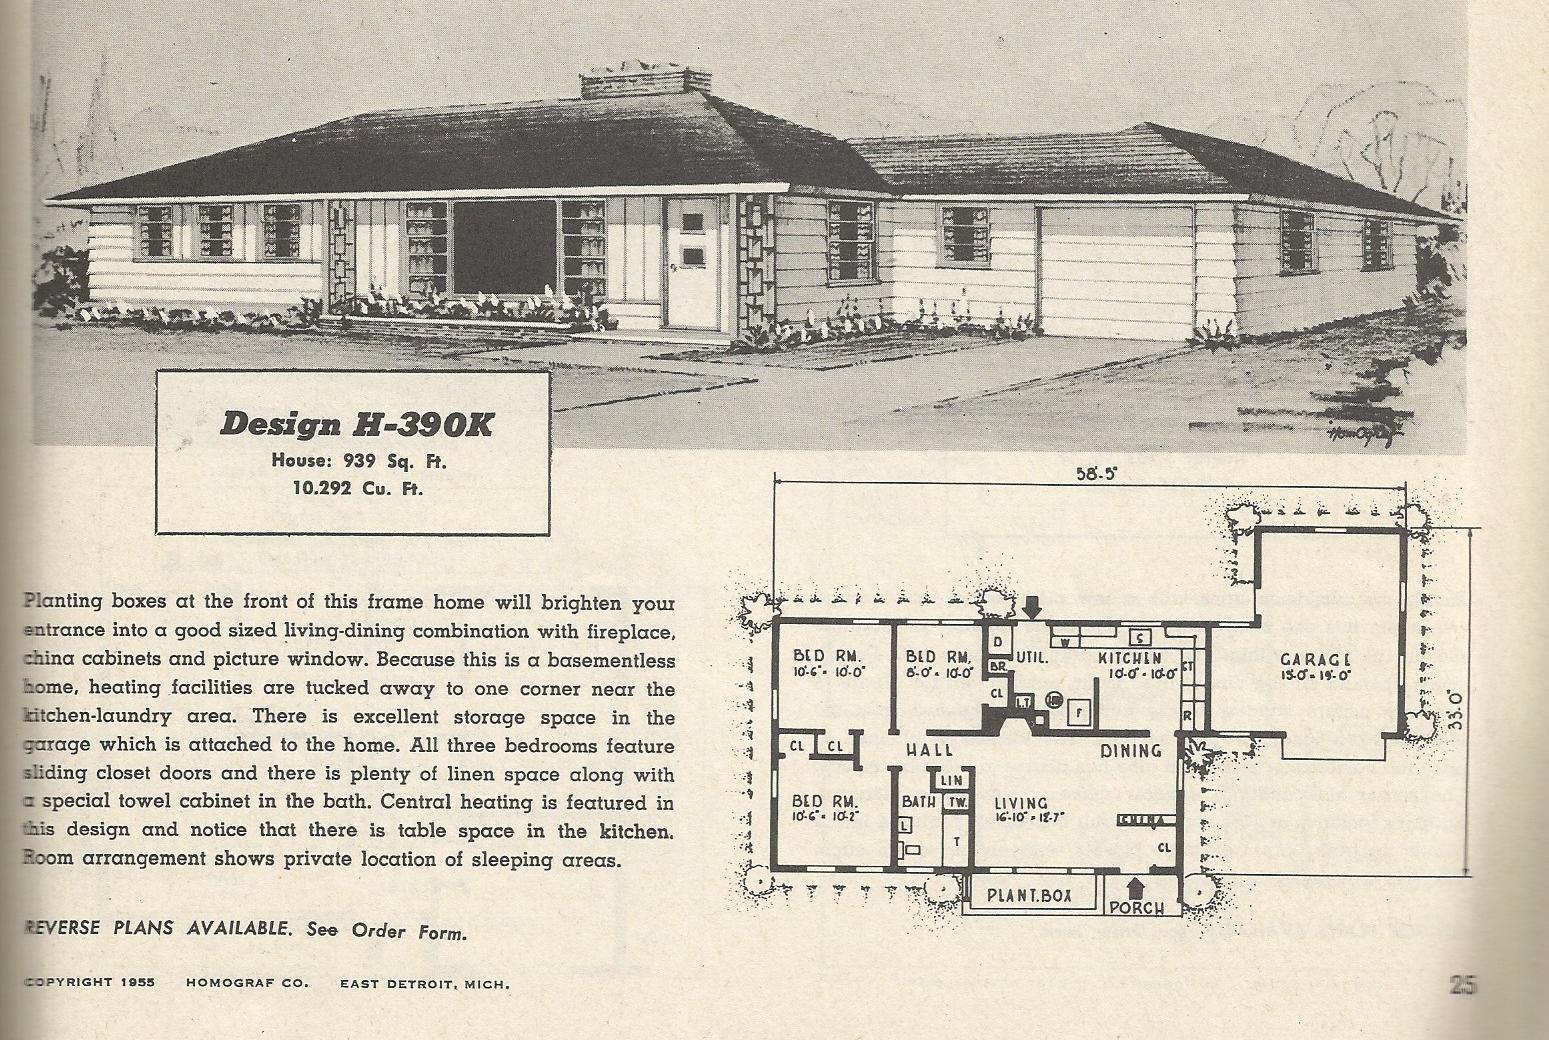 Vintage house plans 390 antique alter ego for Retro modern house plans